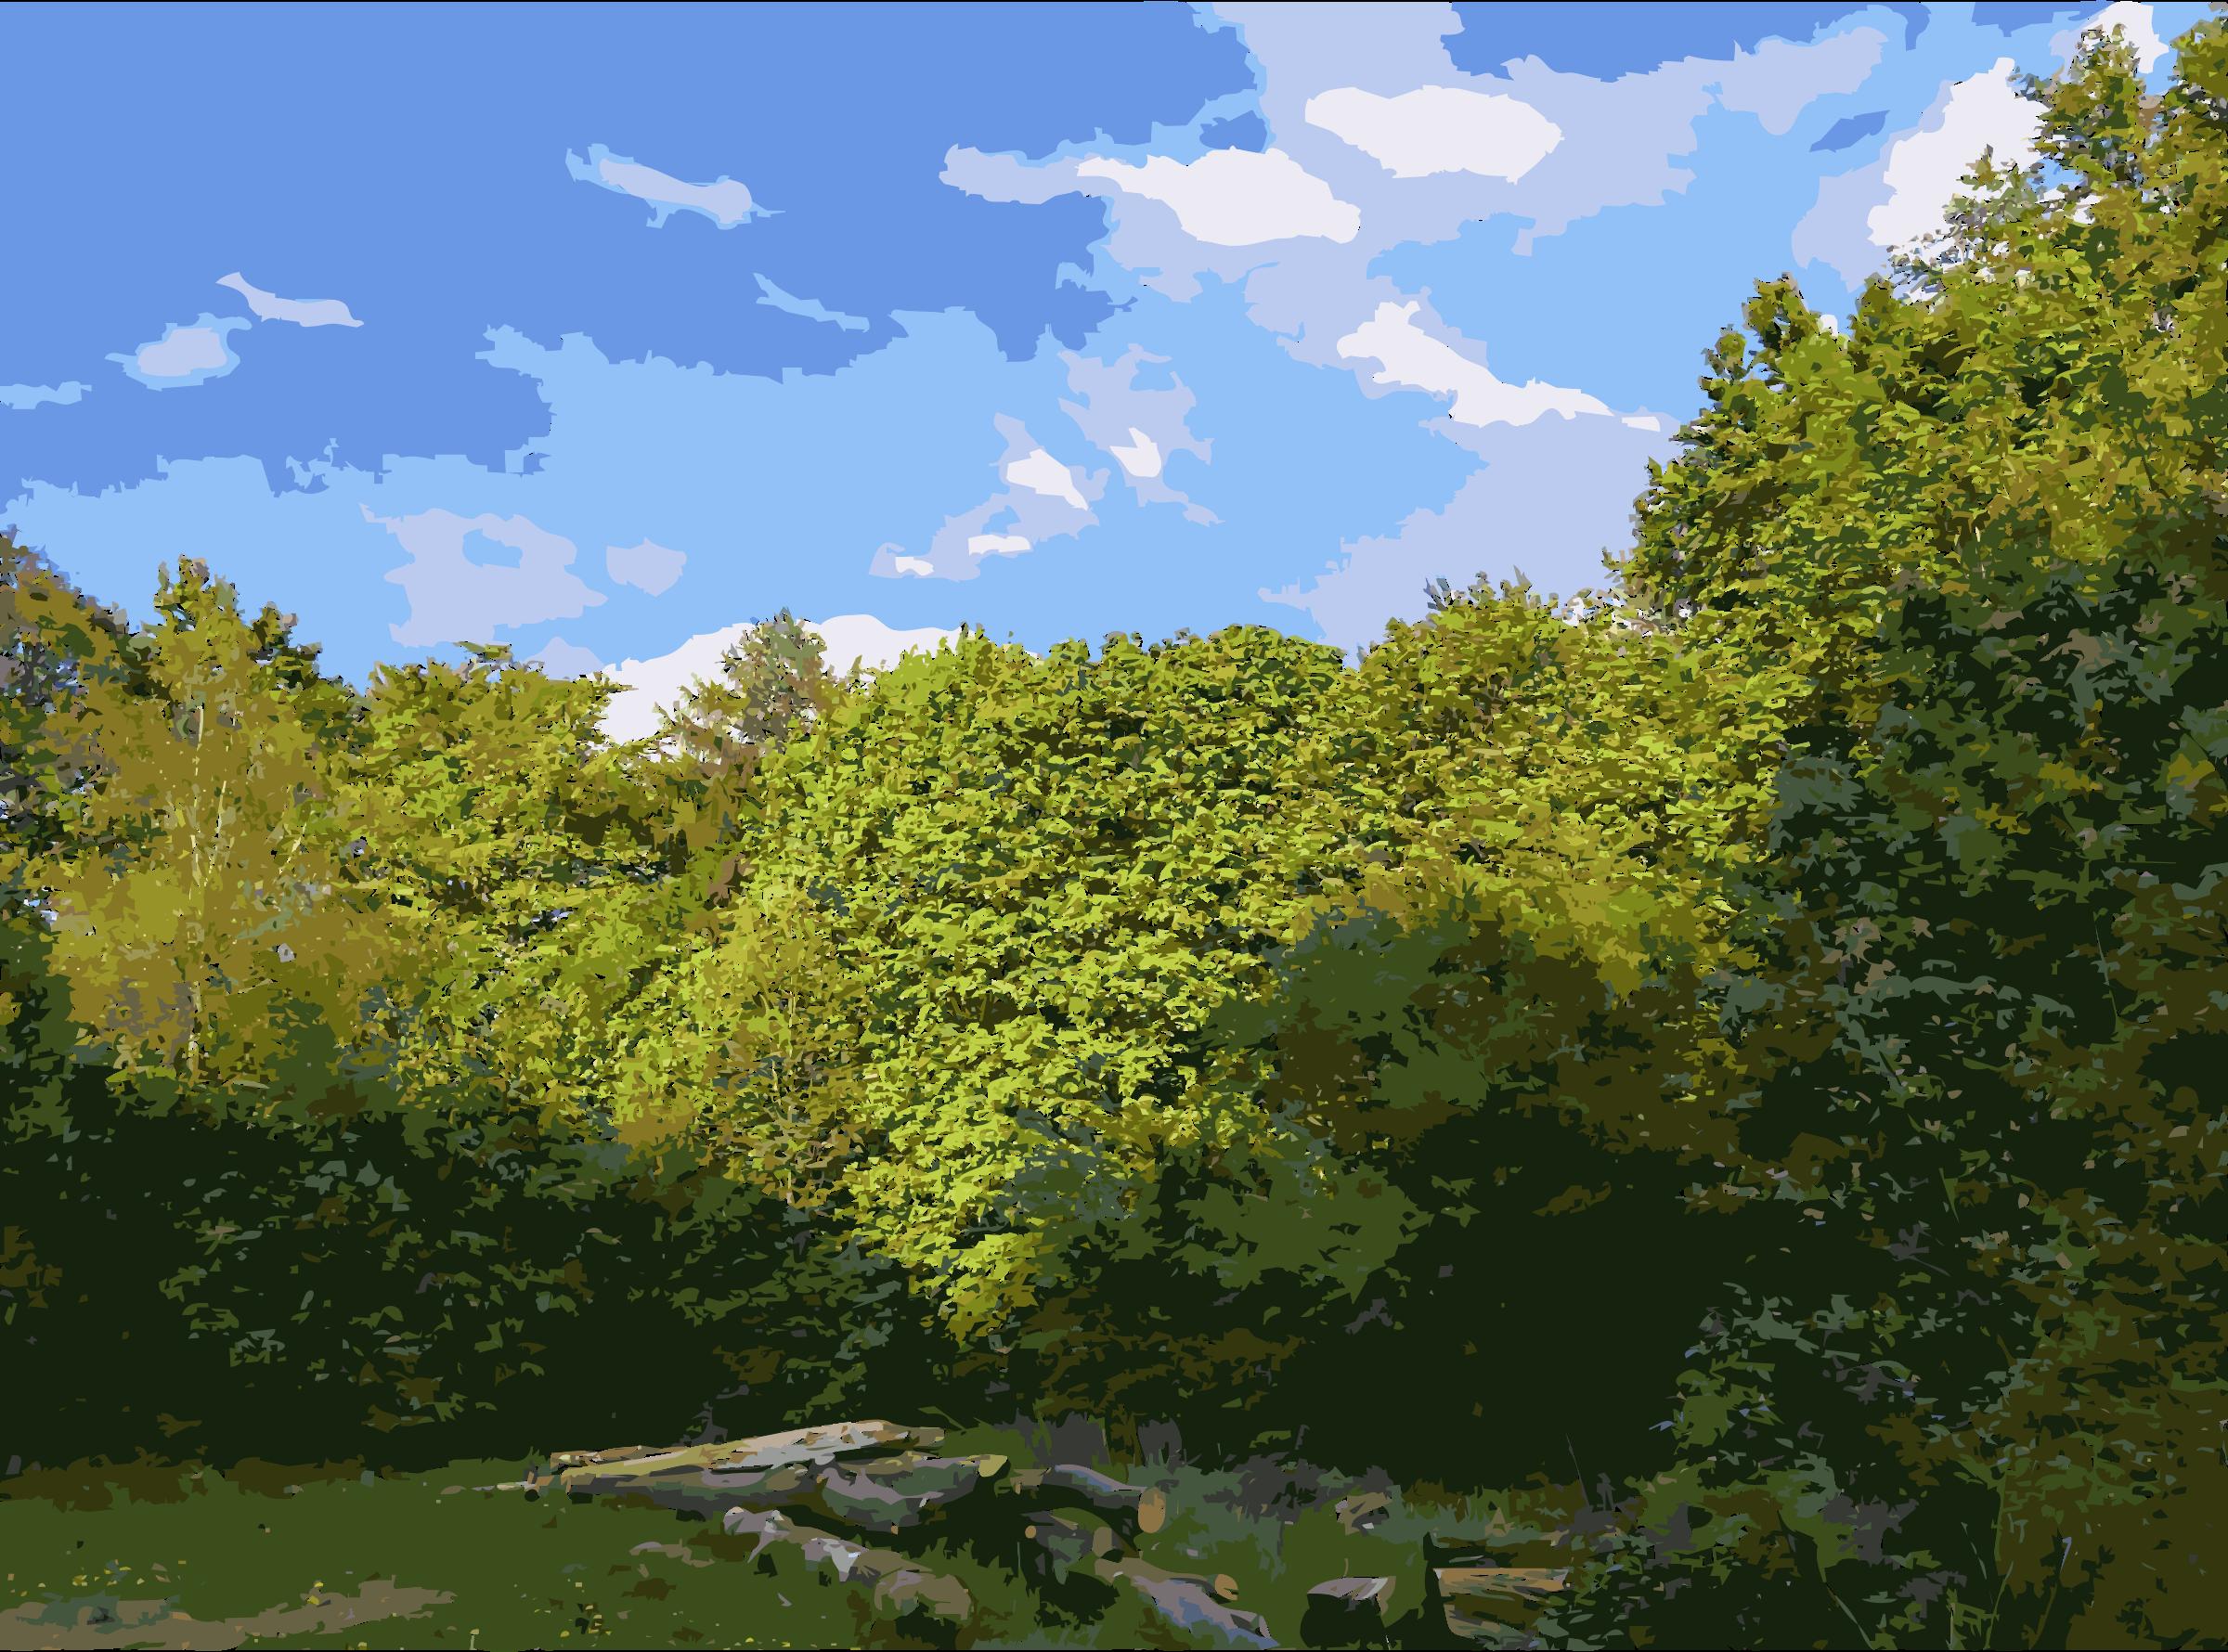 Clipart forest landscape. Lichtscheid again big image